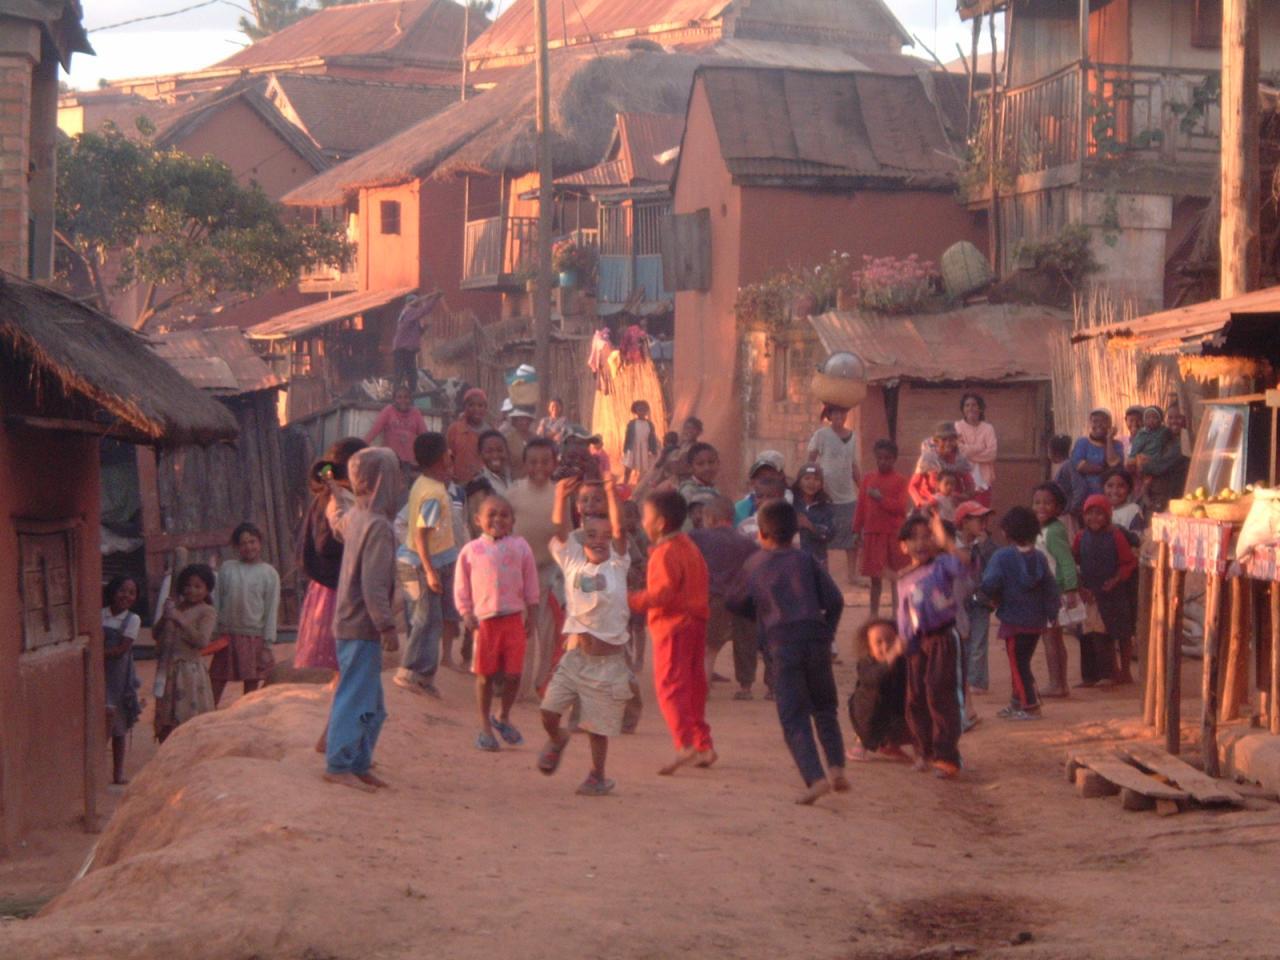 Jeux d'enfants à AMBATOMANJAKA